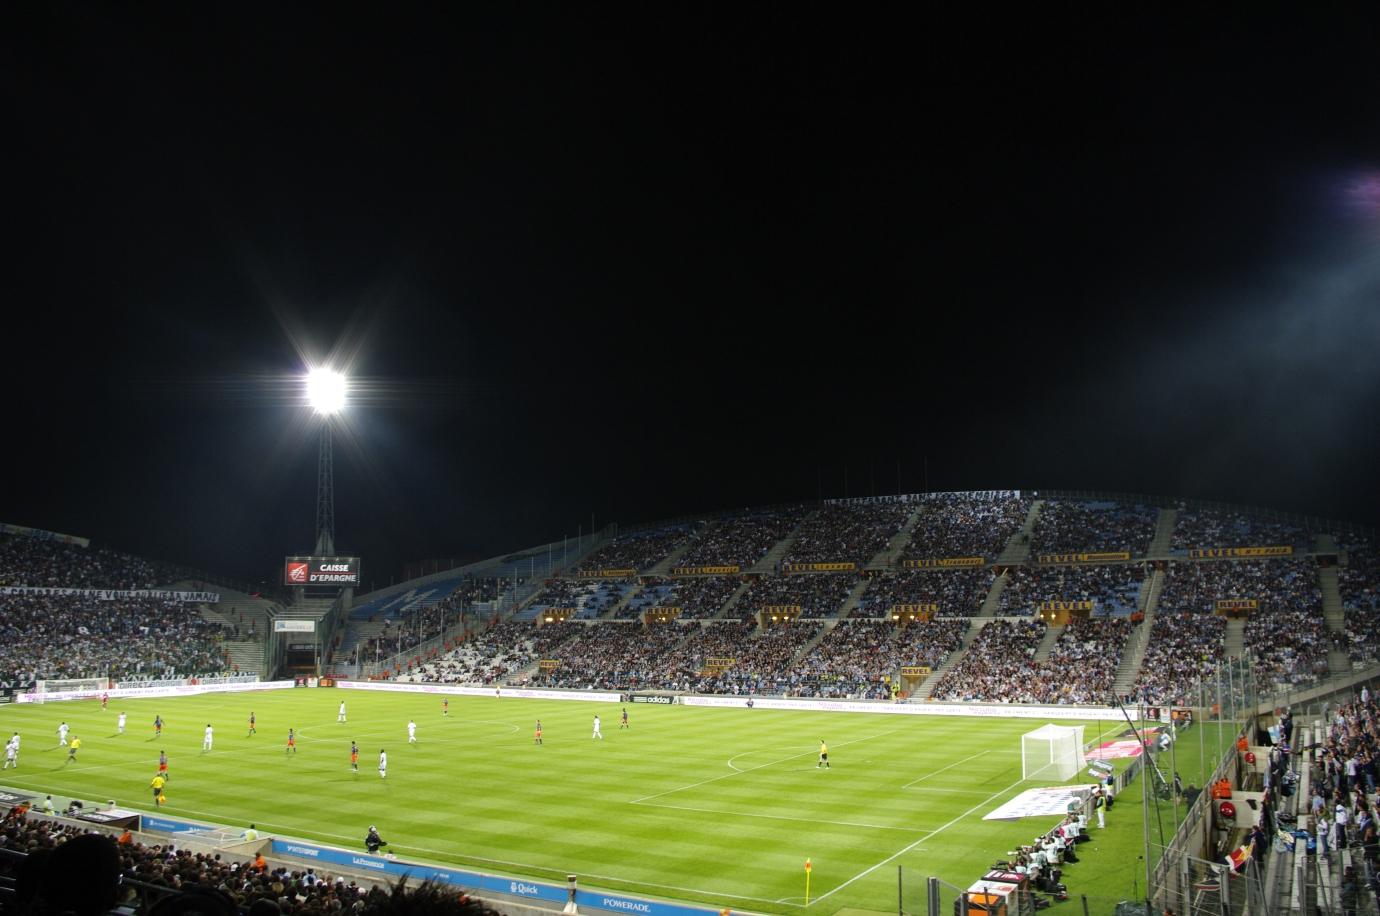 Stade_vélodrome_Olympique_de_Marseille_Montpellier_HSC_Septembre_2009